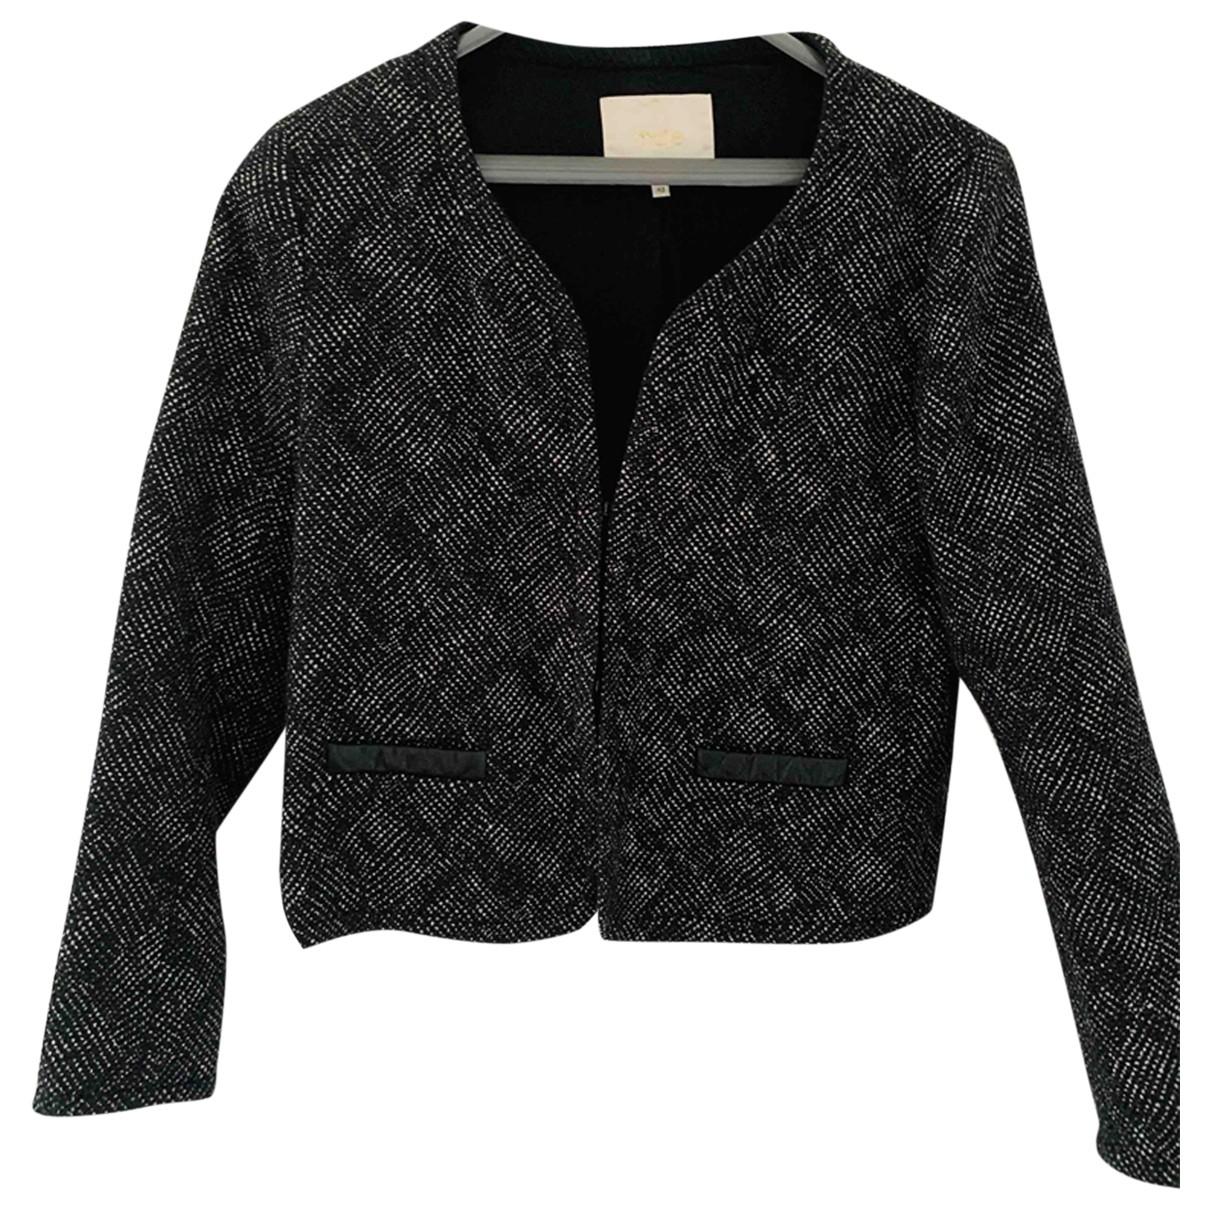 Maje - Veste Fall Winter 2019 pour femme en laine - metallise